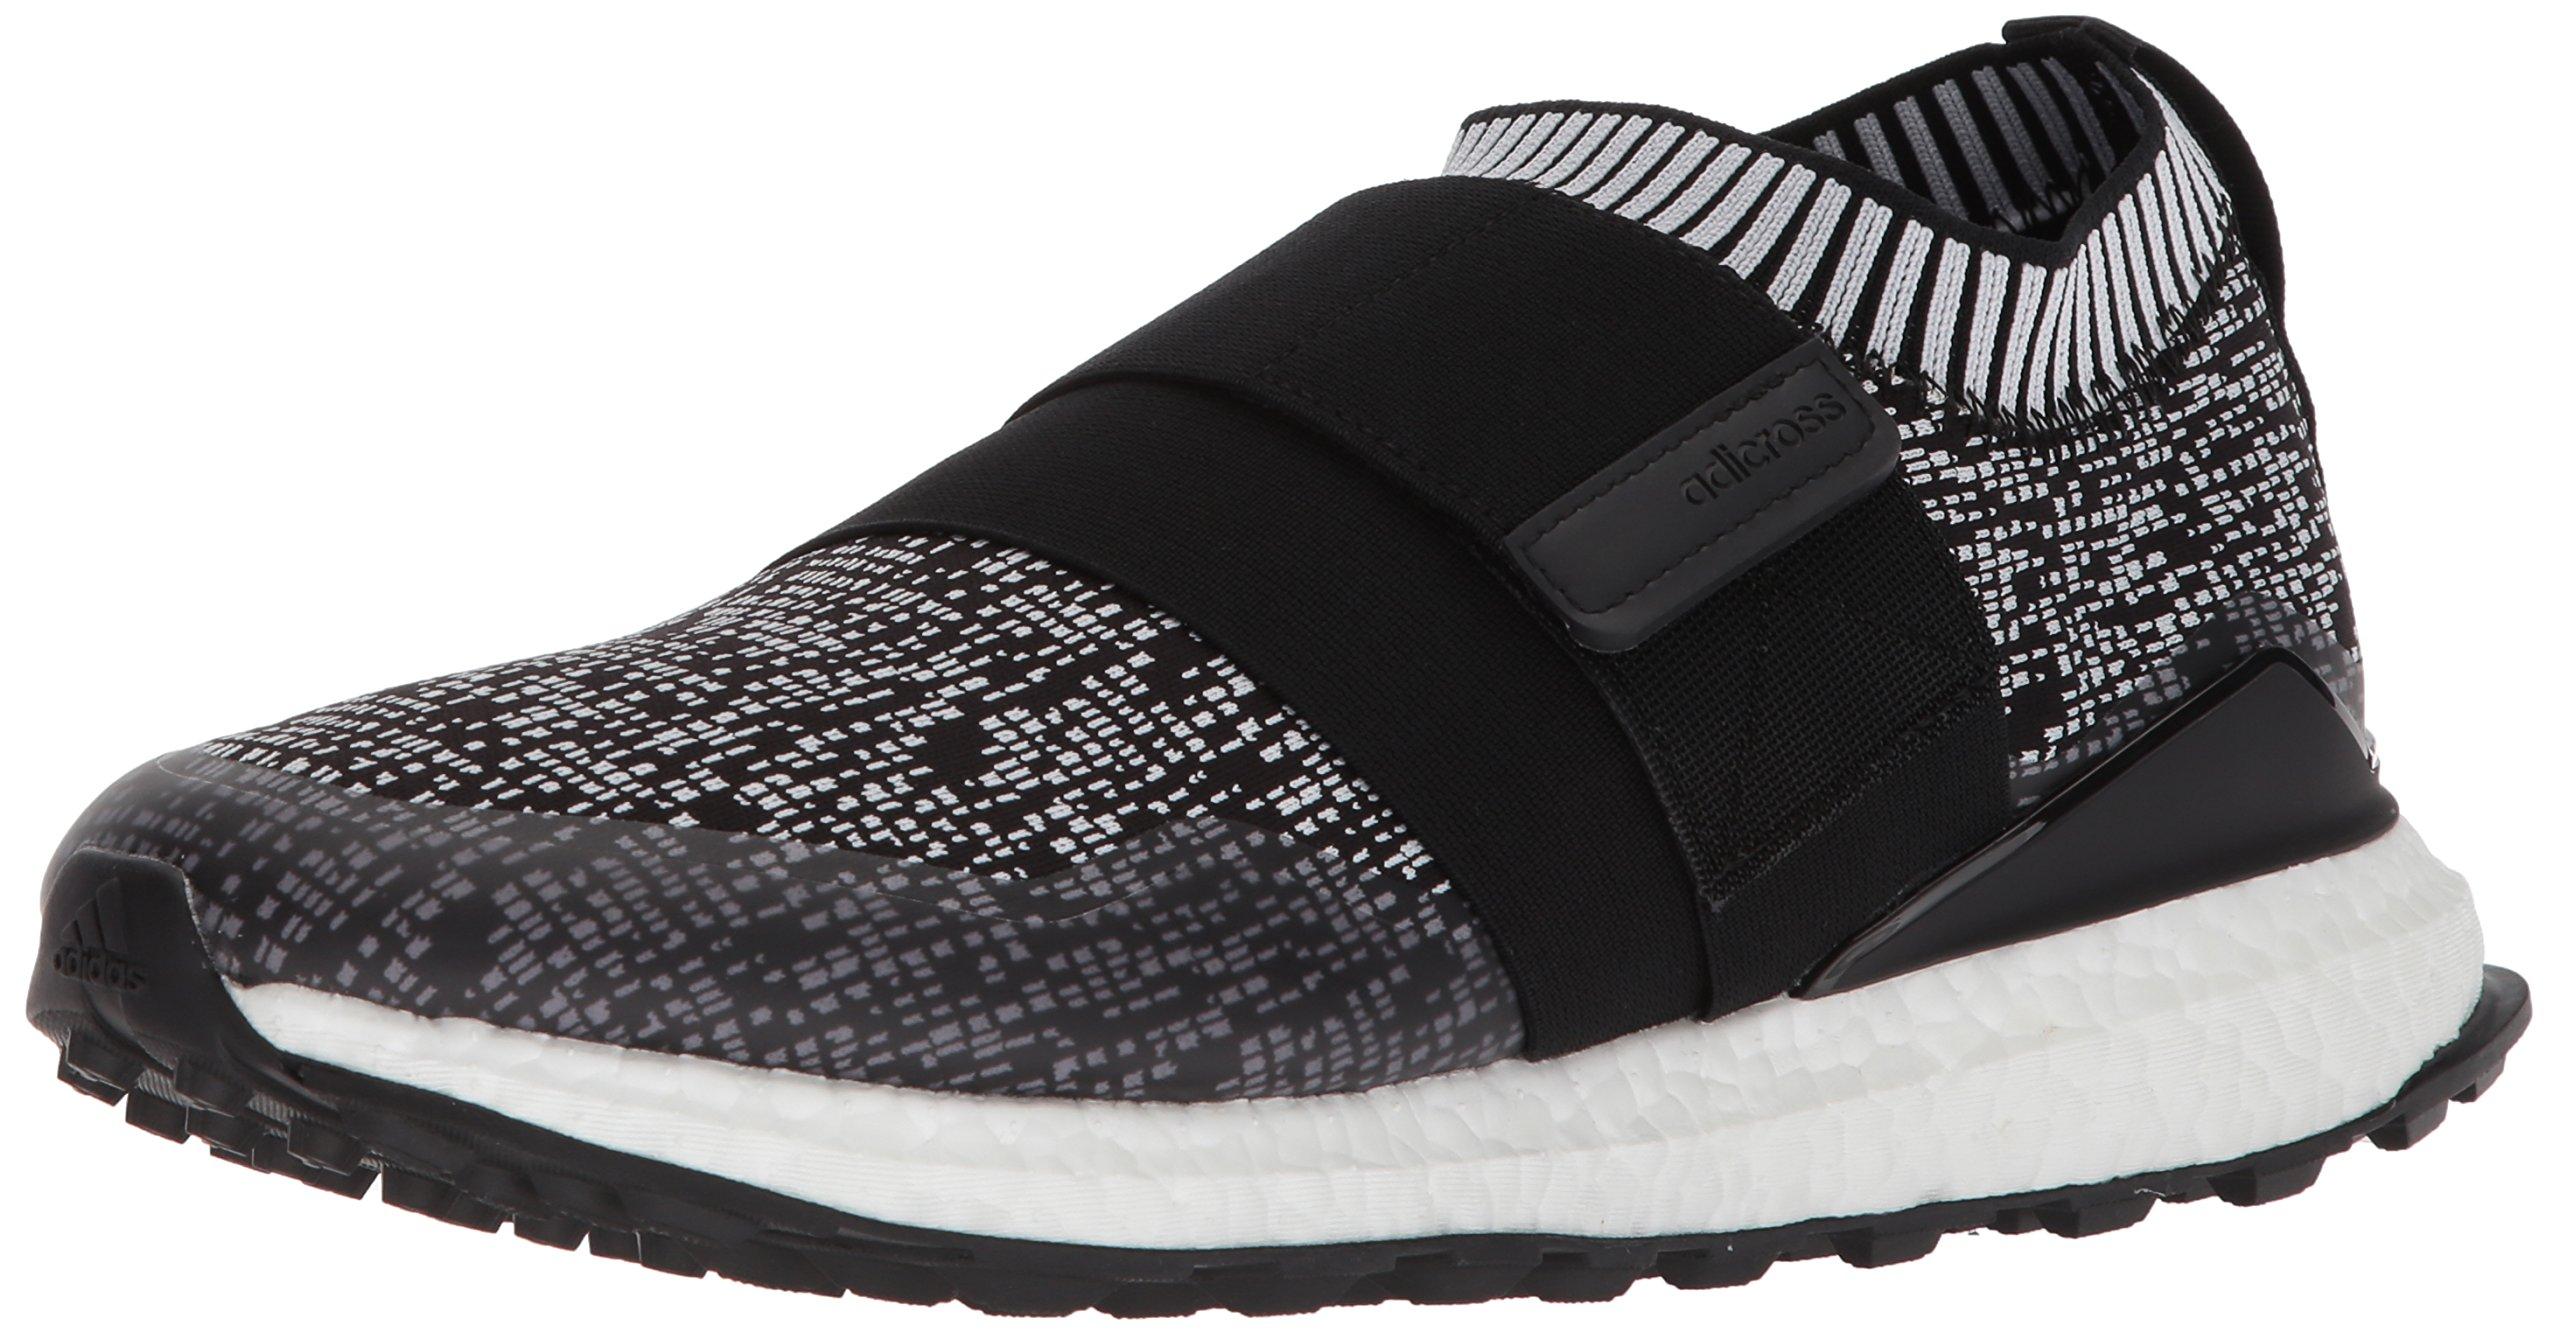 size 40 ceb38 51ea6 Galleon - Adidas Mens Crossknit 2.0 Golf Shoe, Core BlackFTWR White, 8.5  Medium US